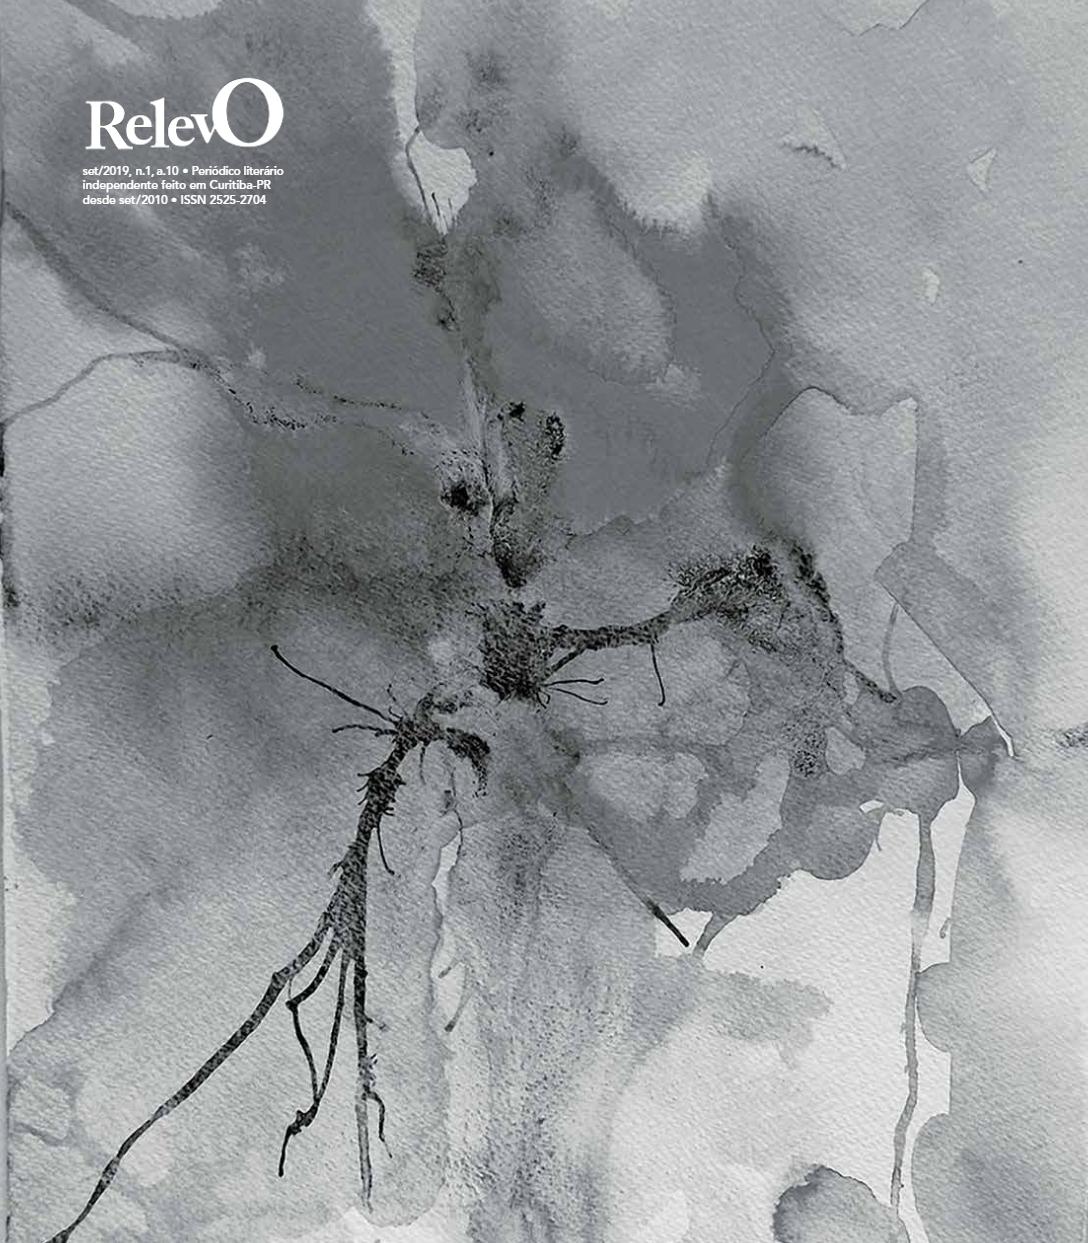 capa Jornal RelevO setembro 2019